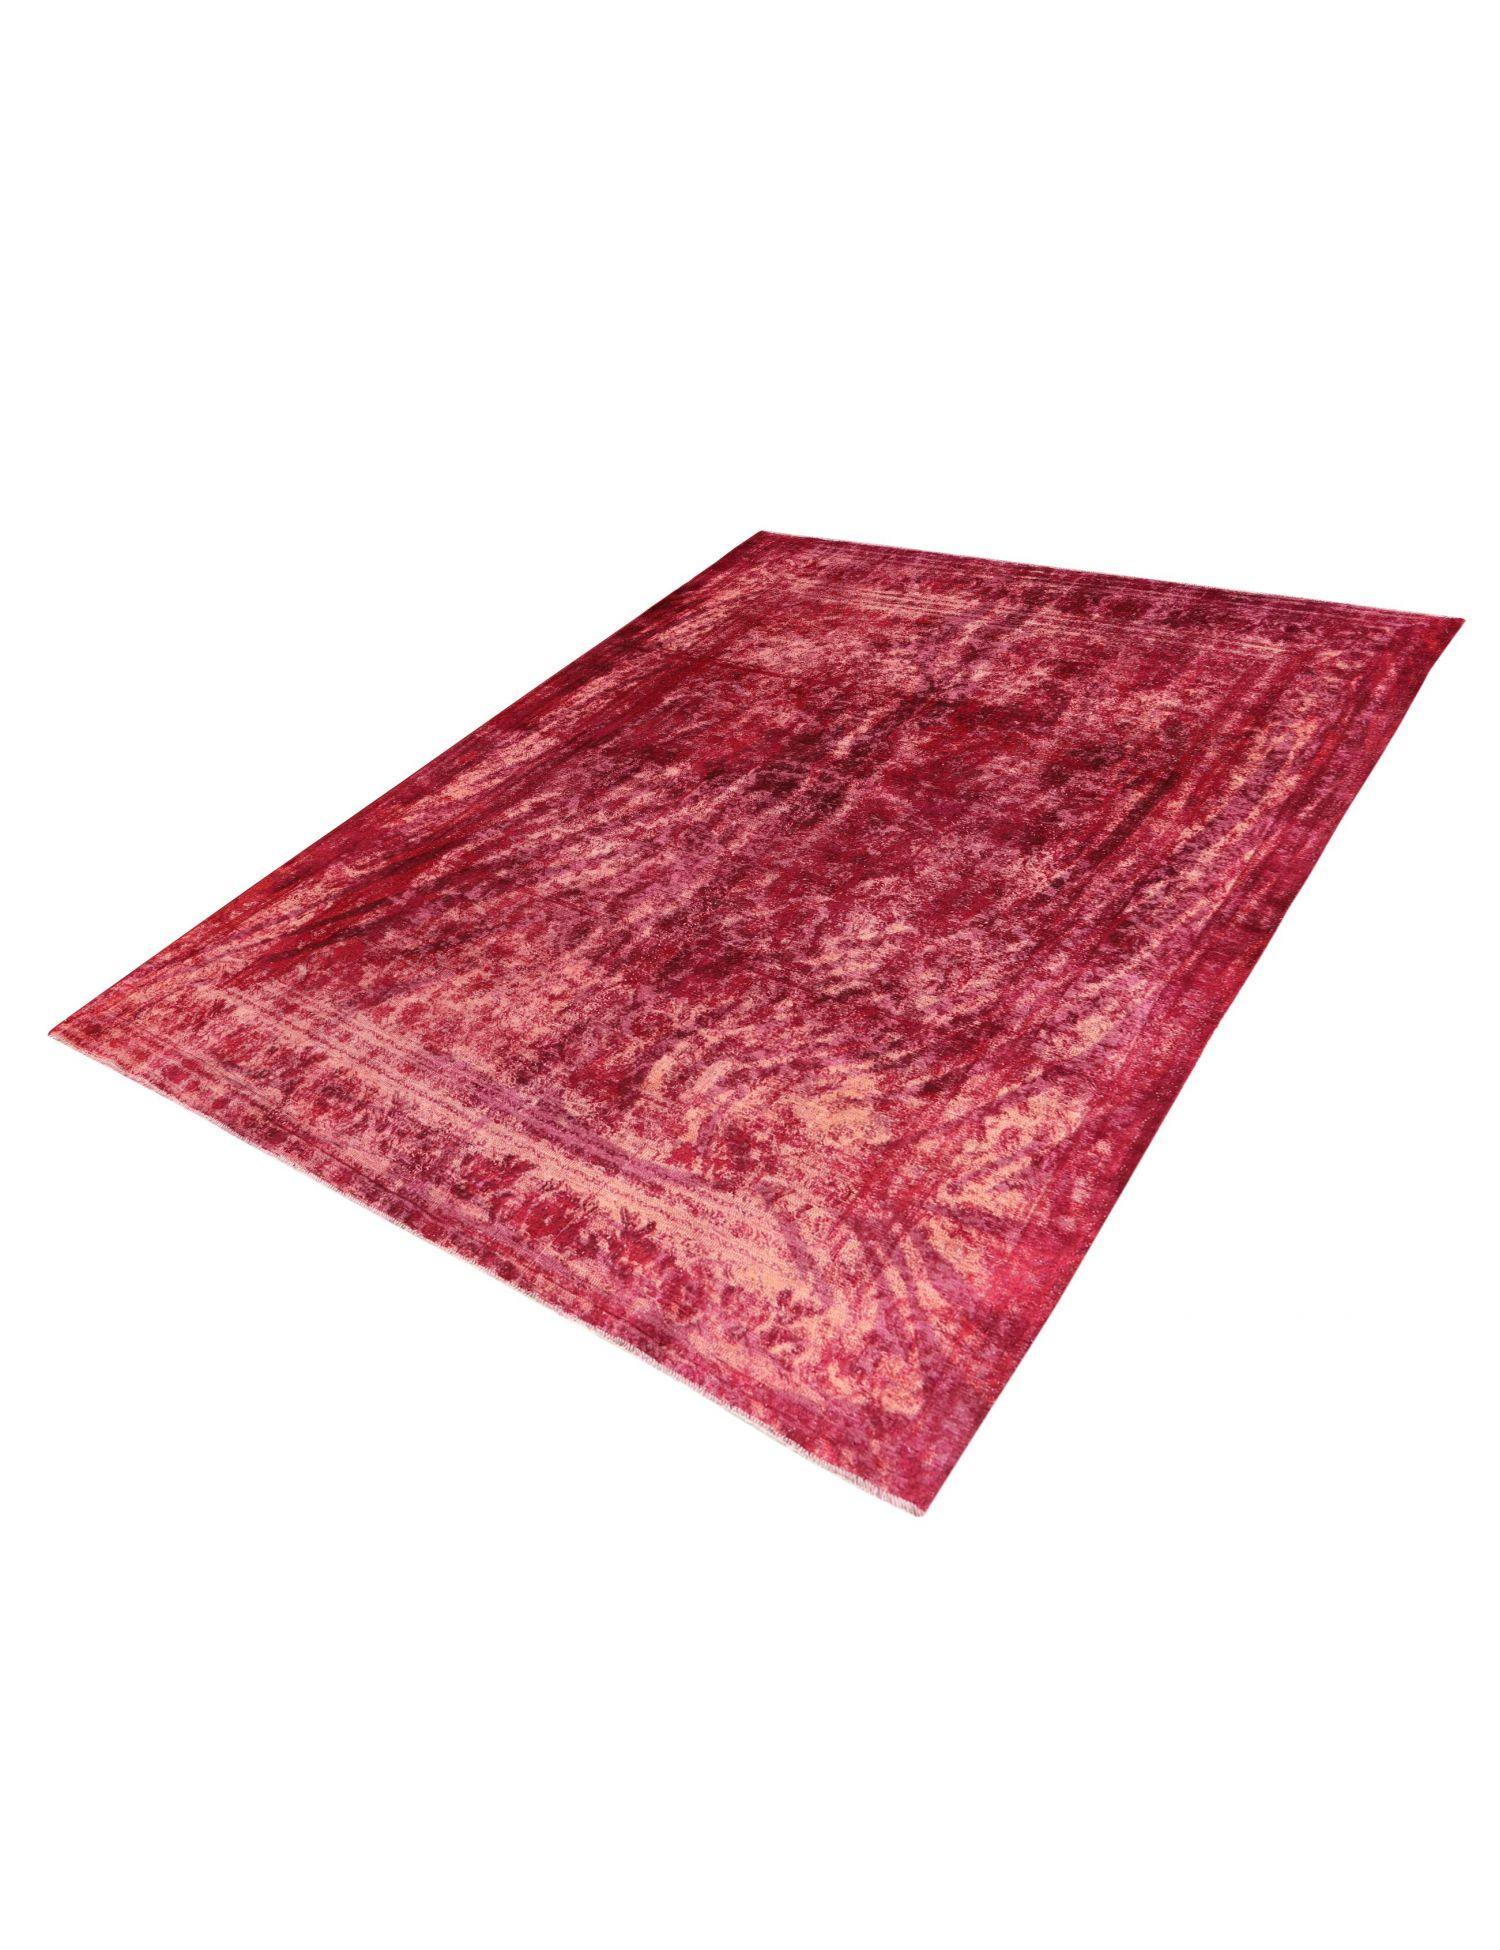 Vintage Teppich  lila <br/>369 x 274 cm